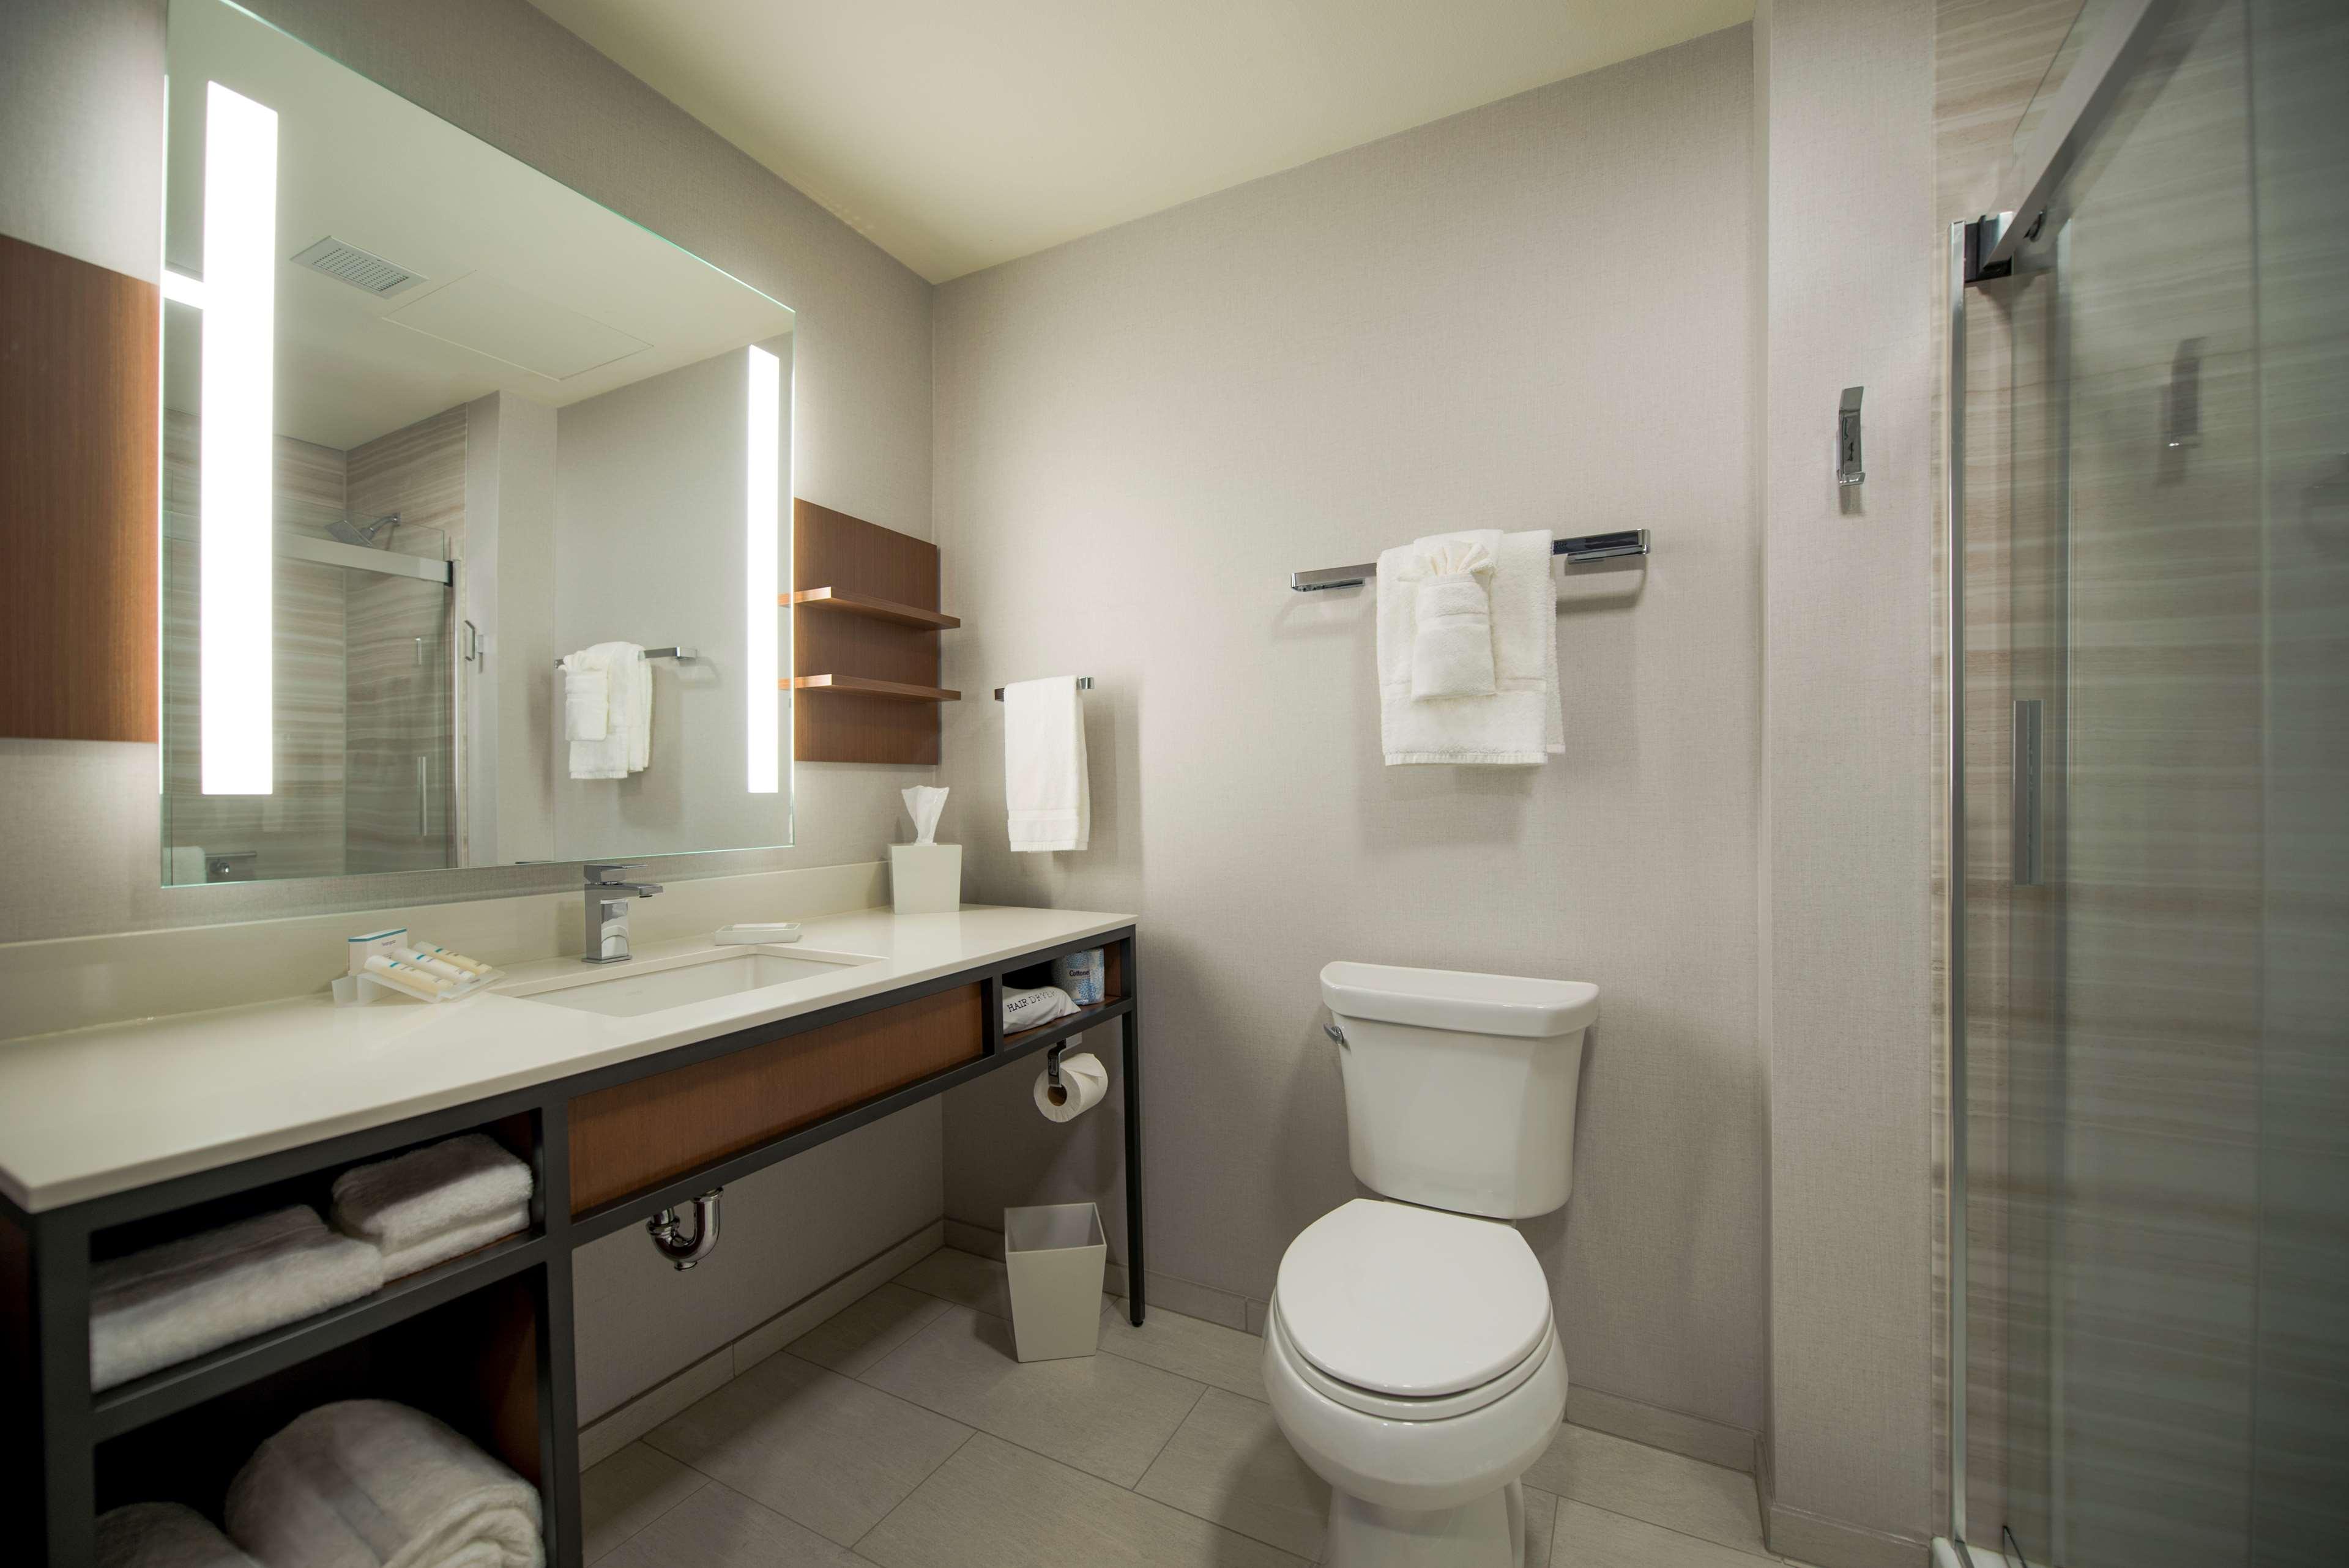 Hilton Garden Inn Wausau image 17